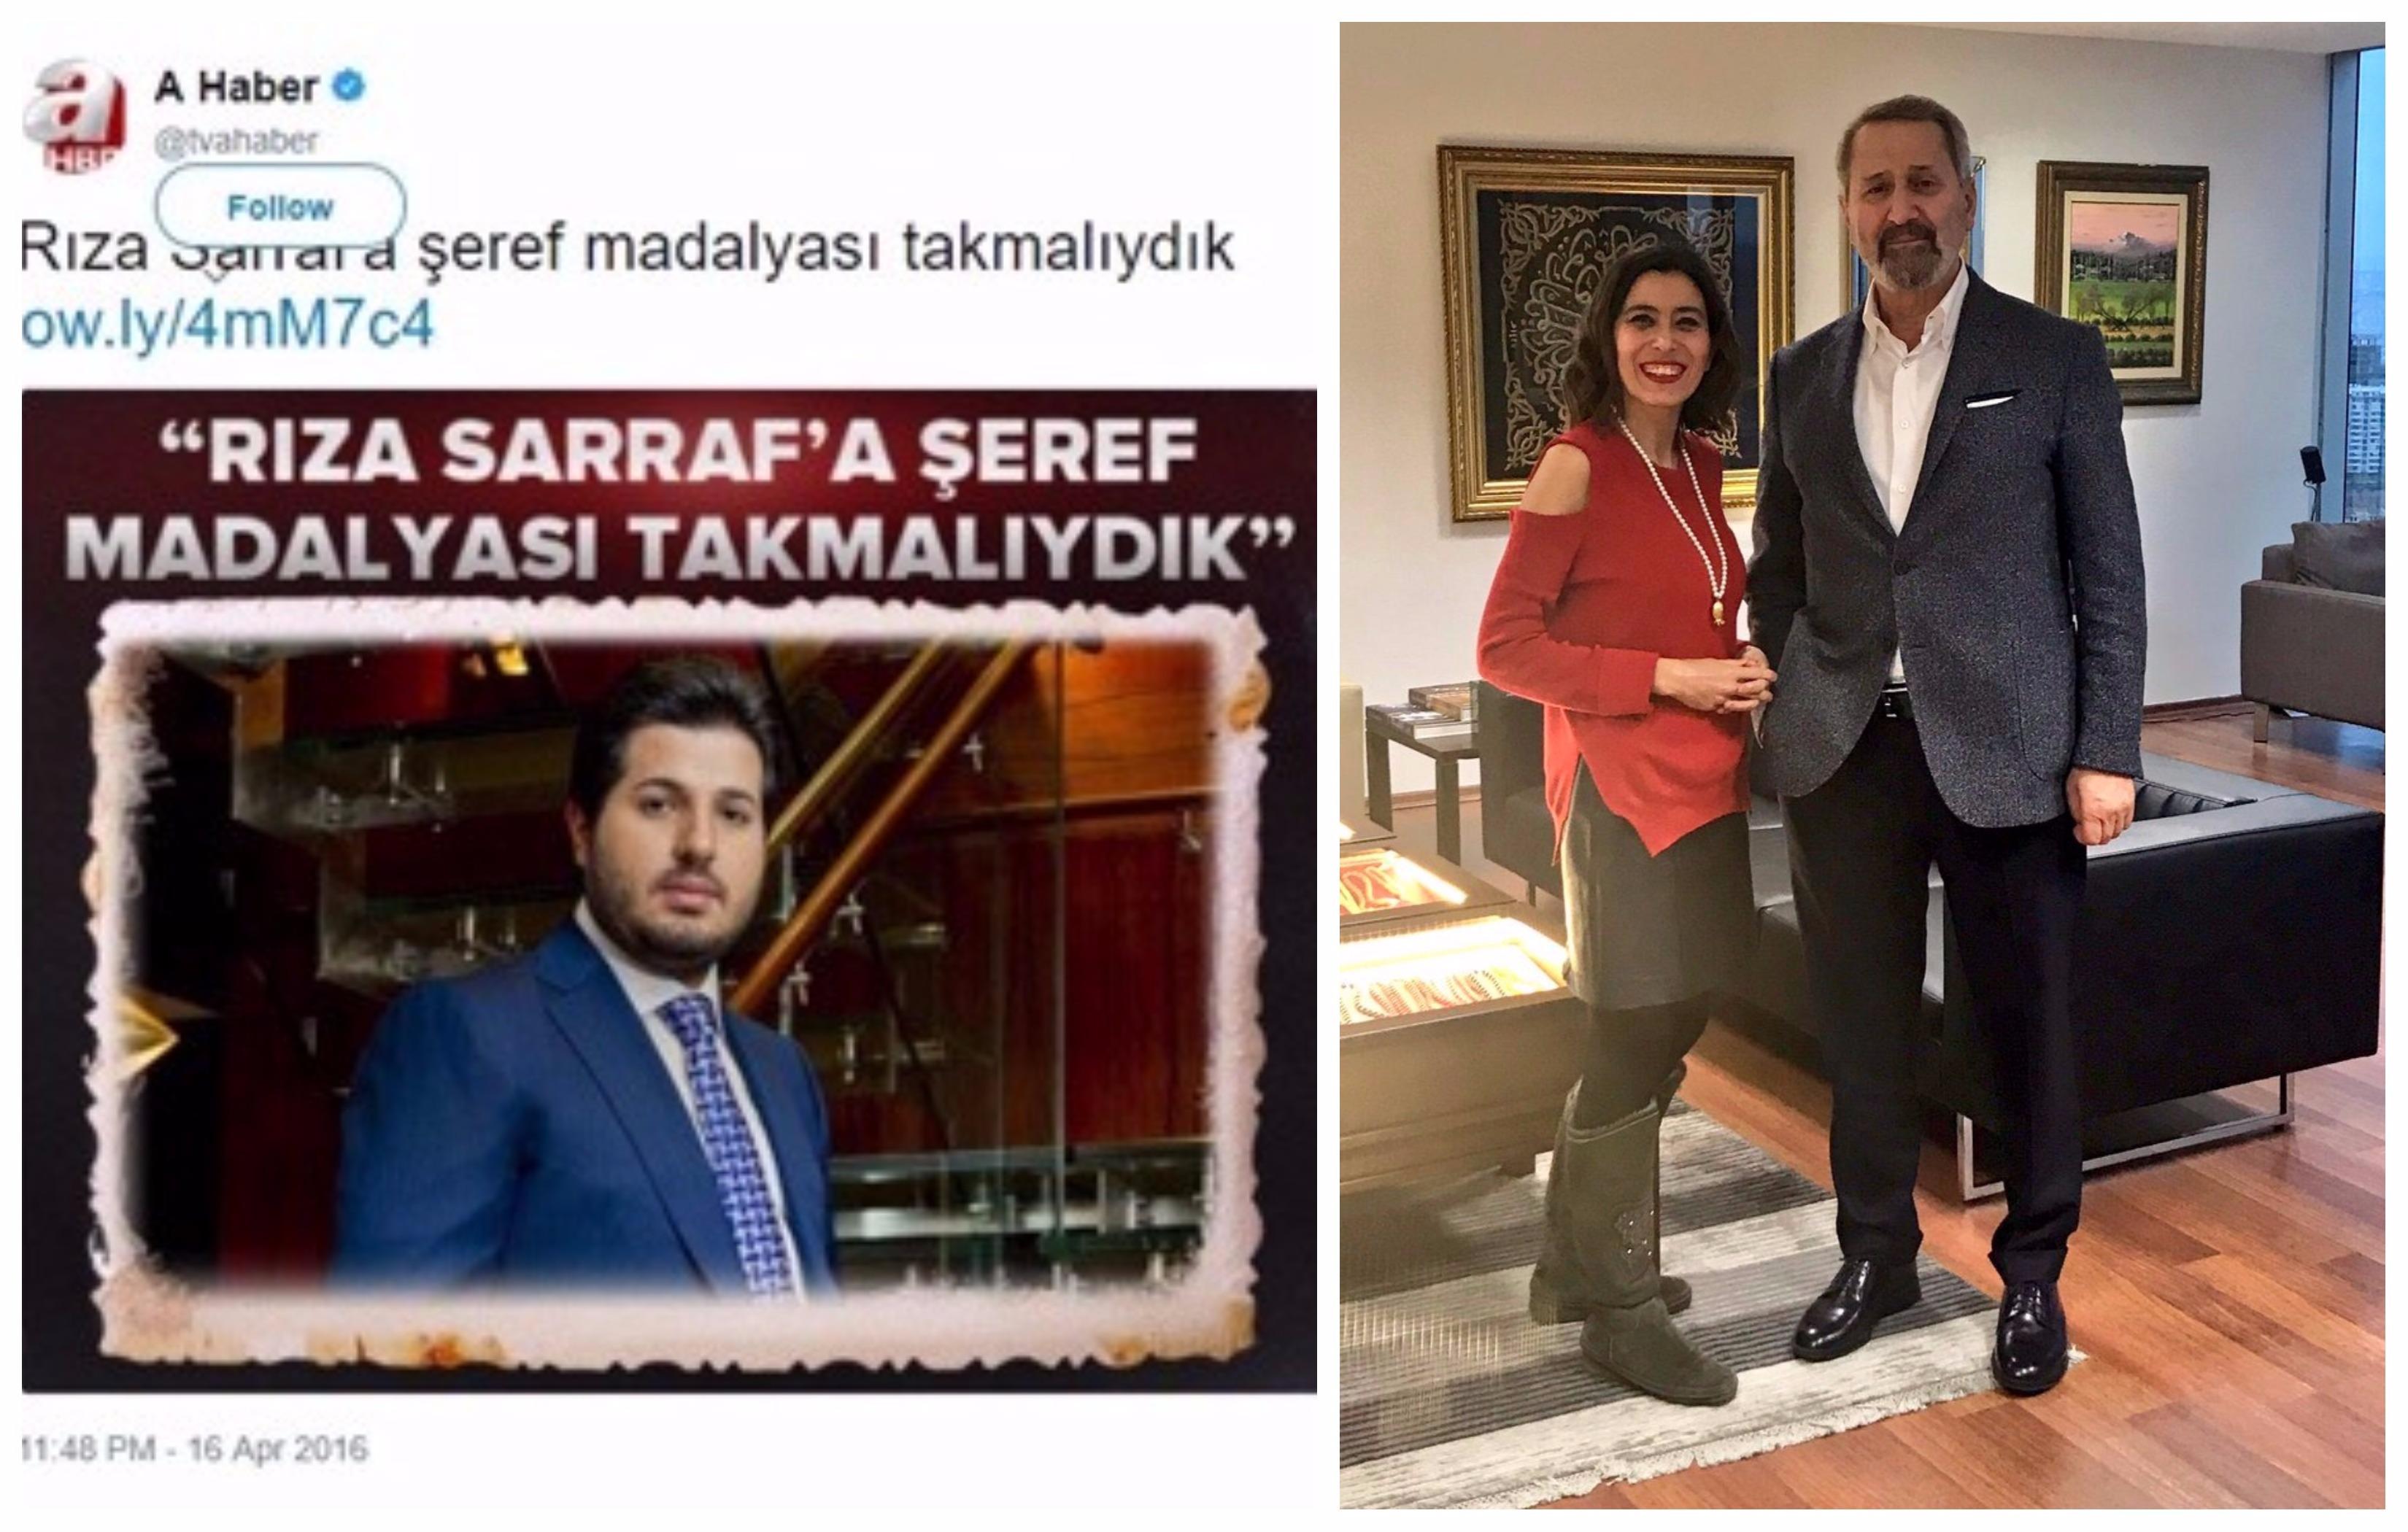 Yandaş kanal Sarraf'ı sildi, muhabiri Çağlayan'la fotoğraf paylaşıp küfür etti: